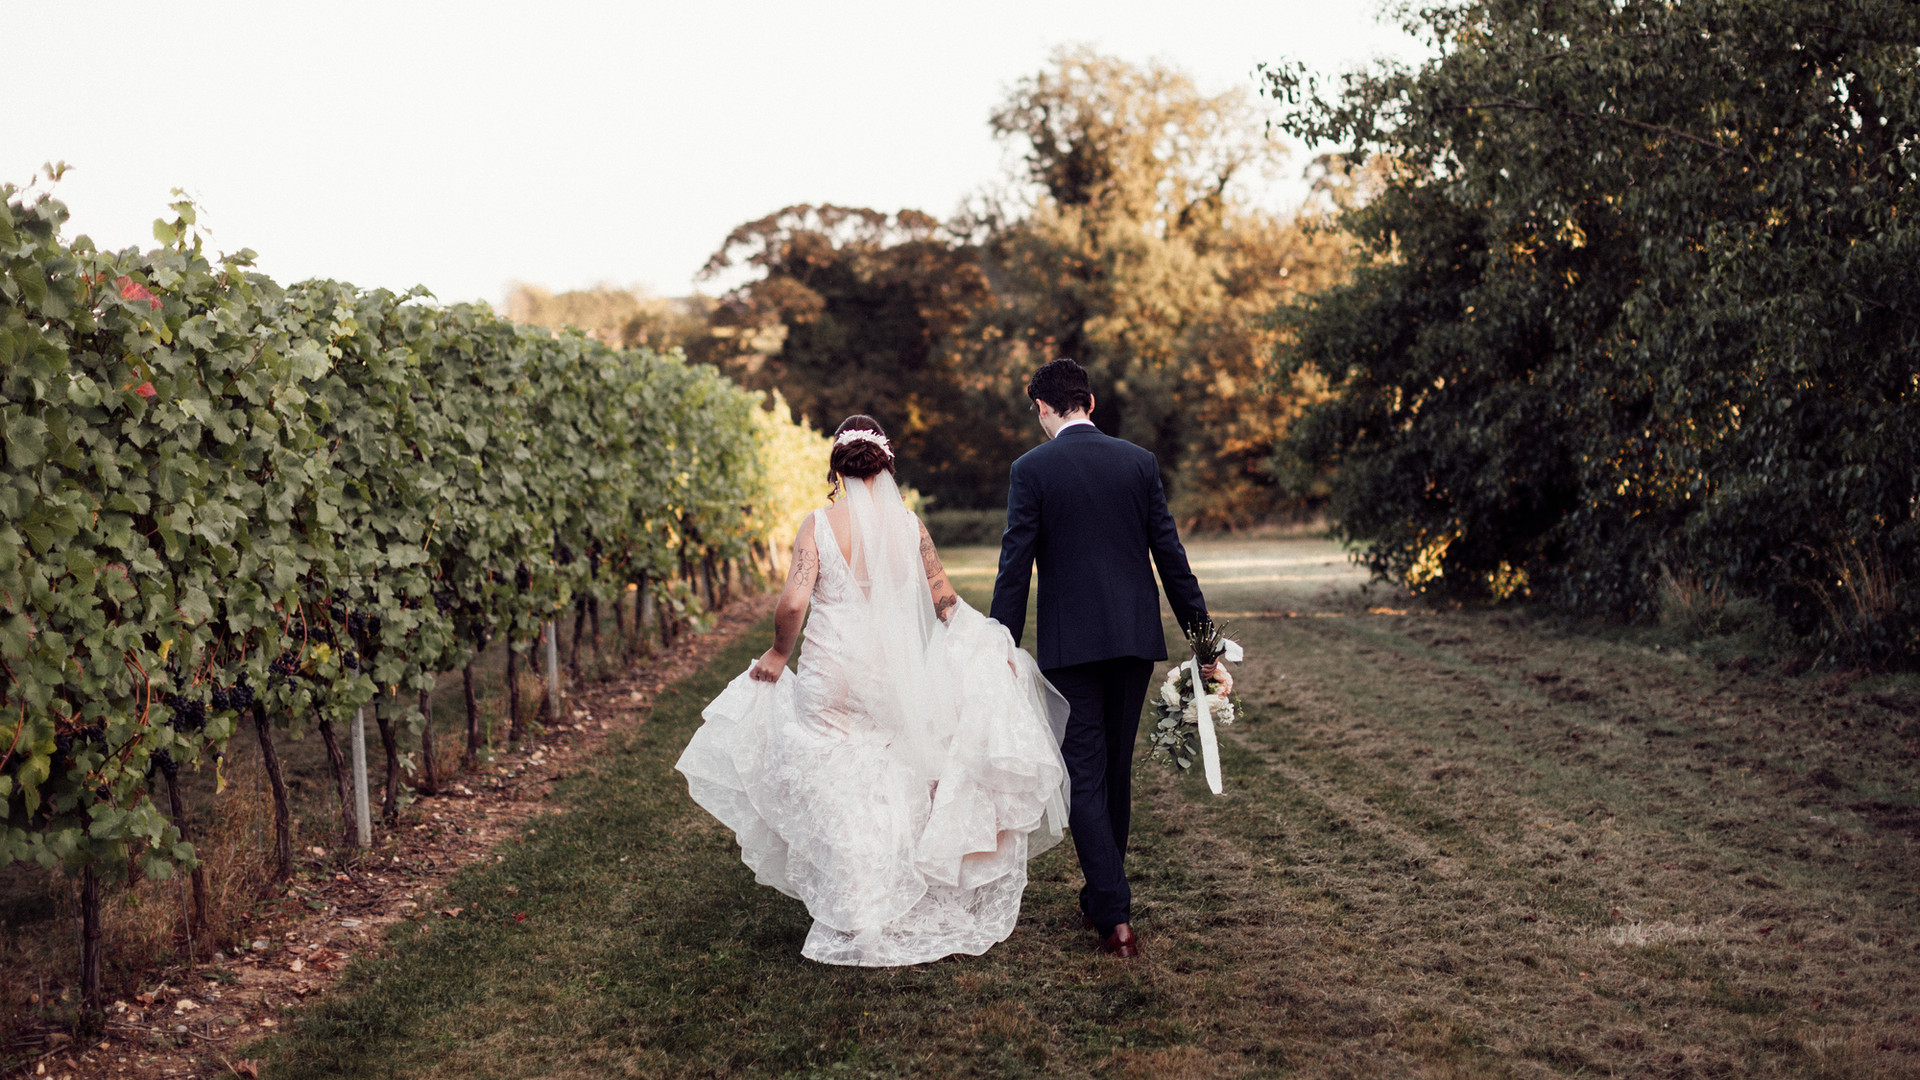 Bride and Groom at Tuffon Hall Vineyard.